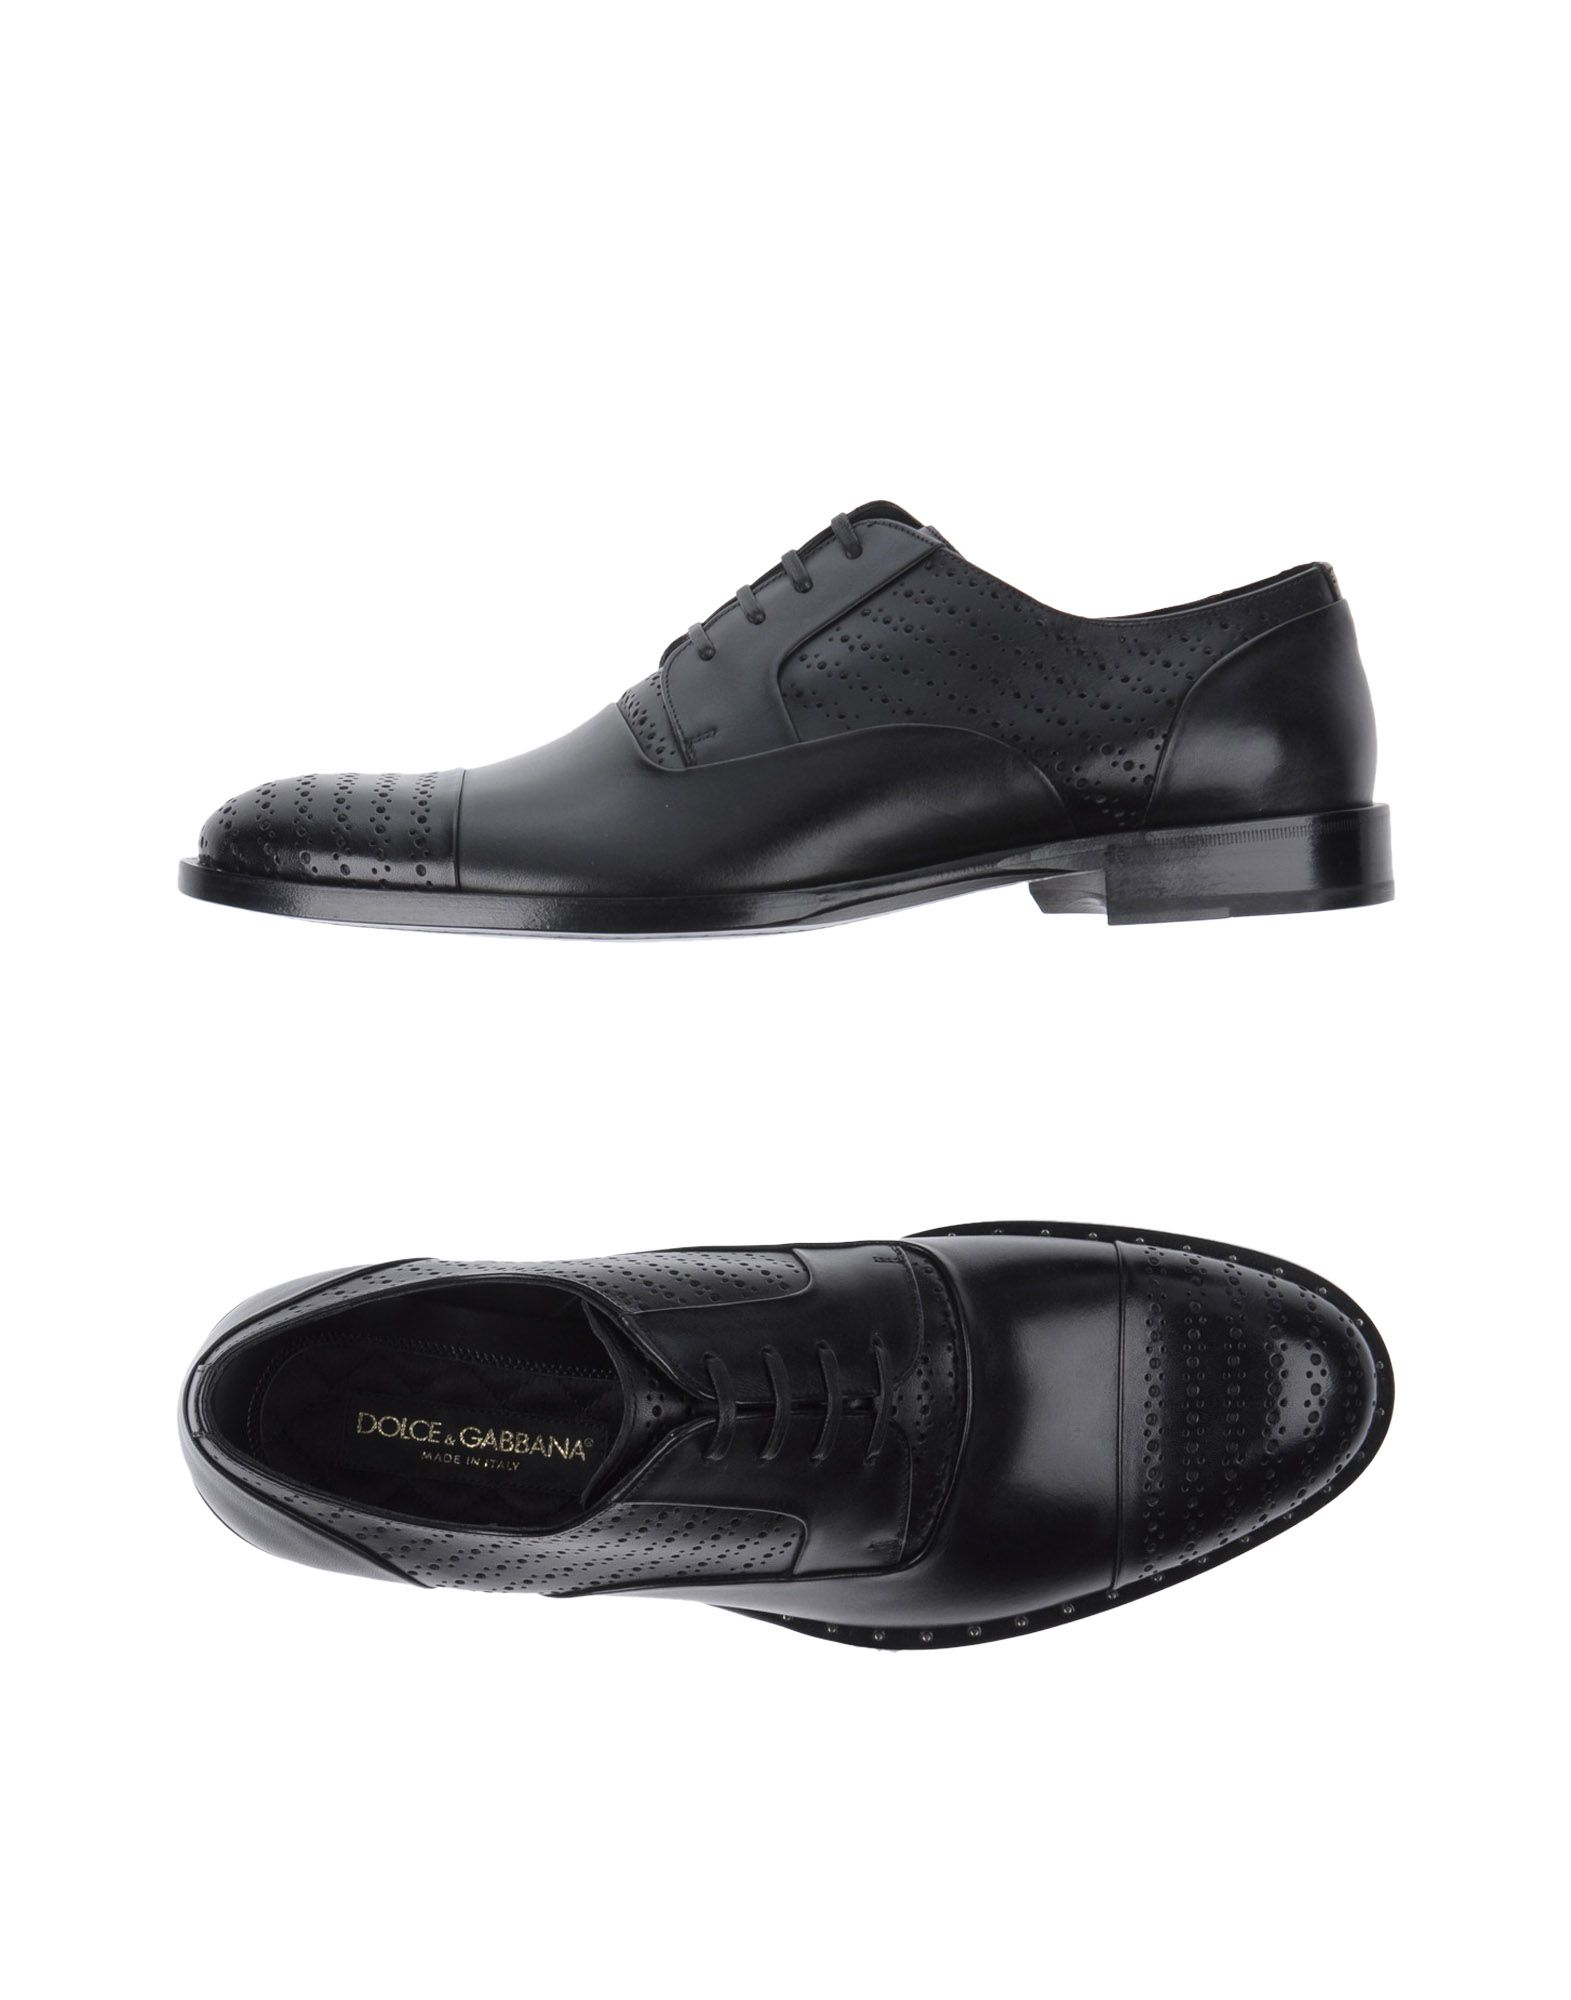 Stringate - Dolce  Gabbana Uomo - Stringate 11143707GV 027527